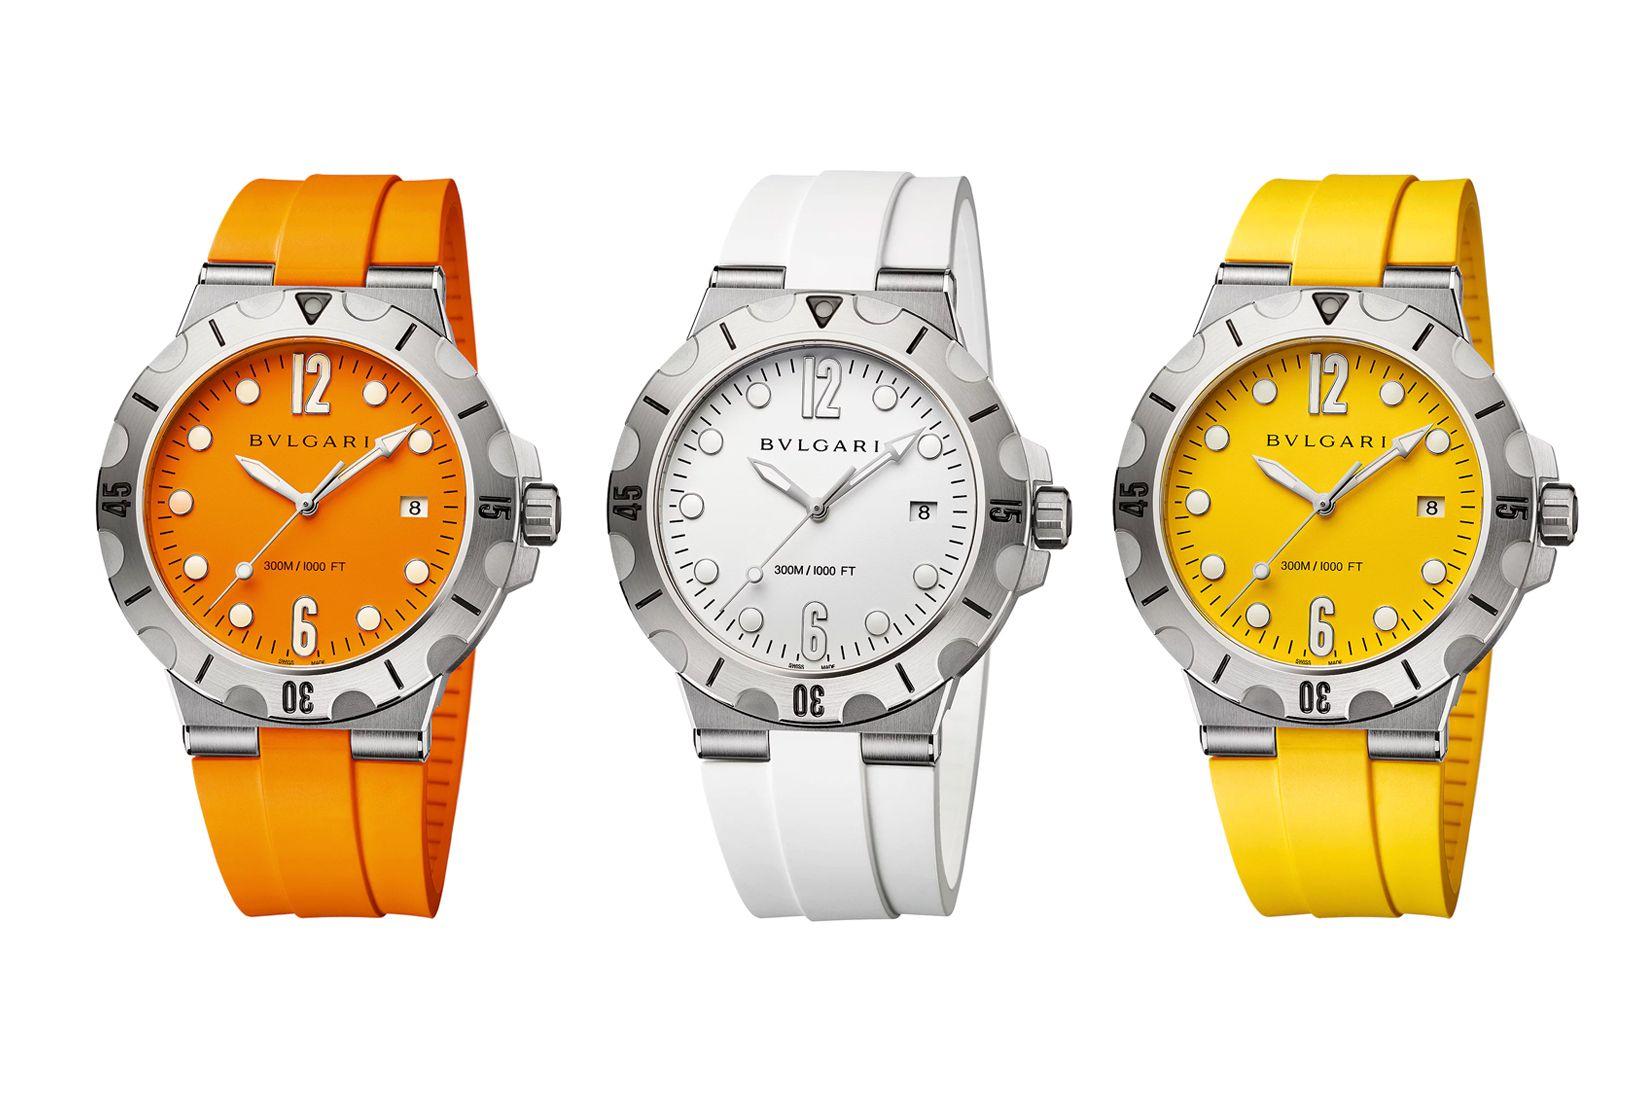 The Bulgari Diagono Scuba Dive Watch Series Is Made for Beach Season